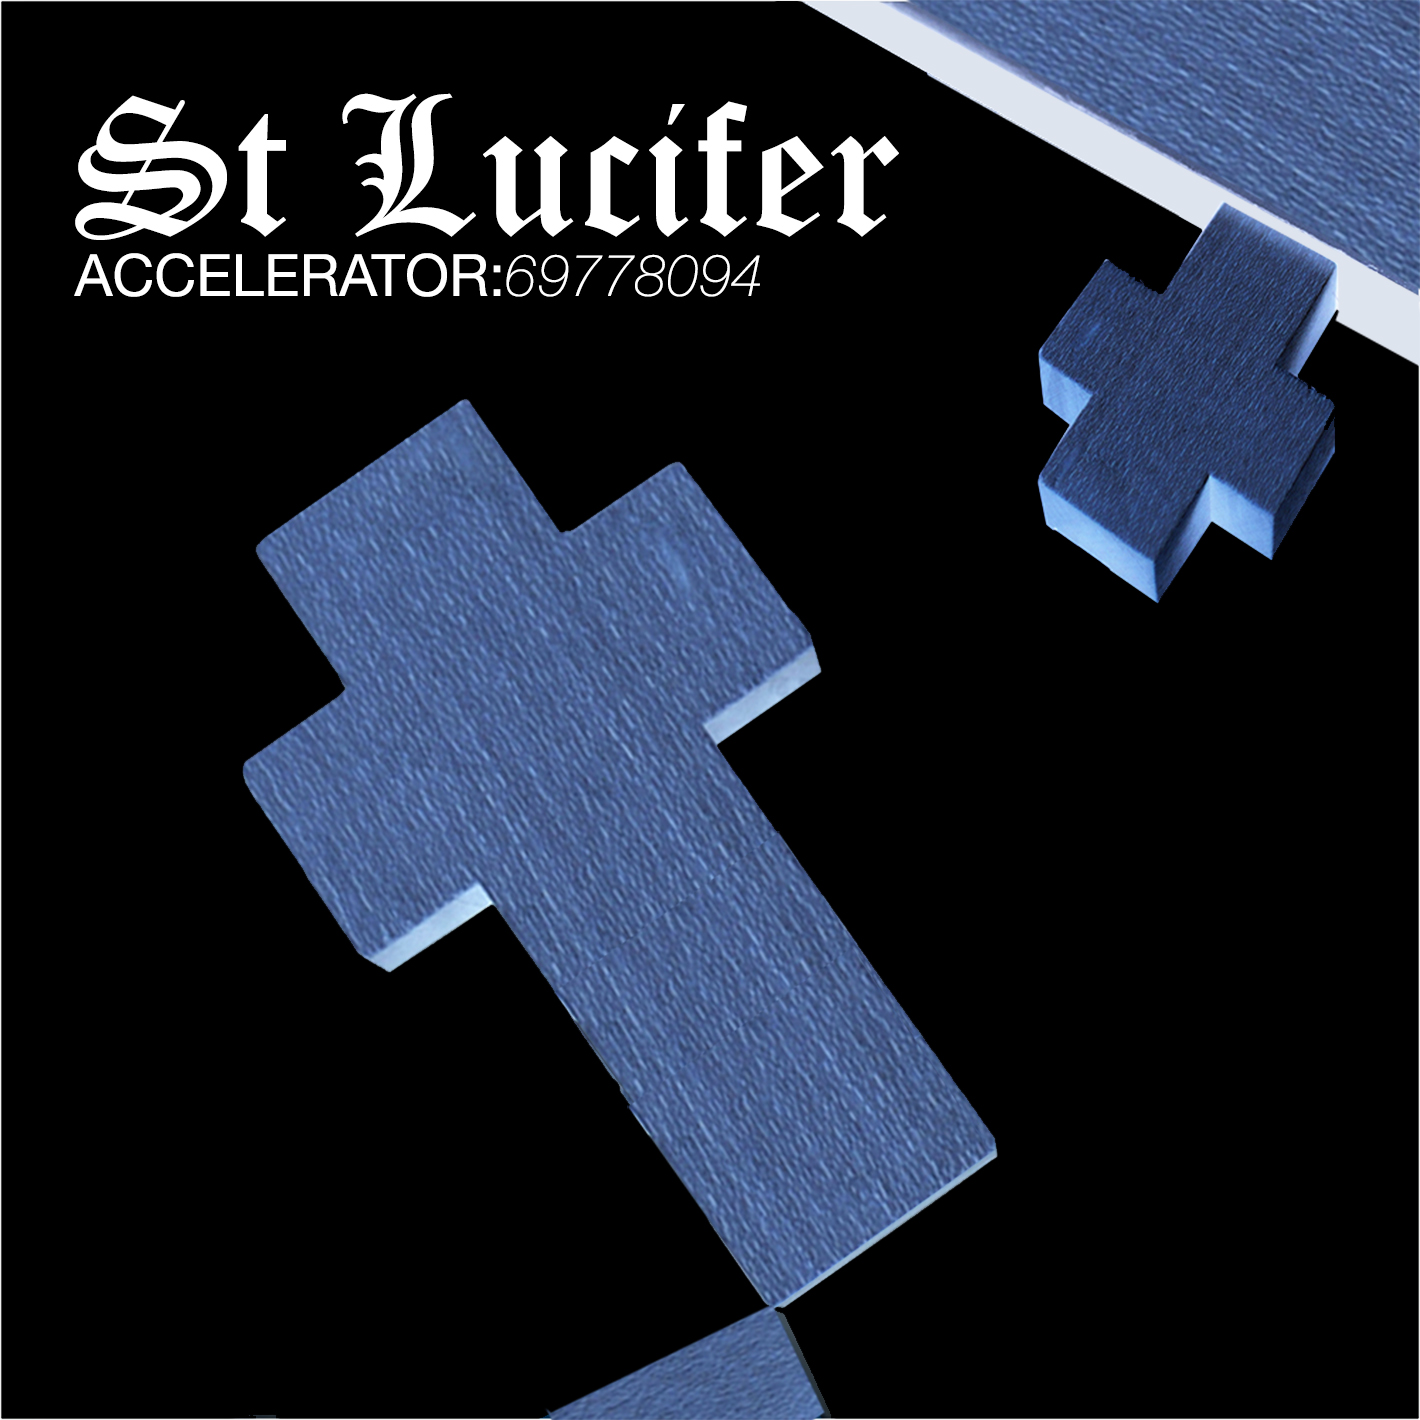 St Lucifer - Accelerator:69778094